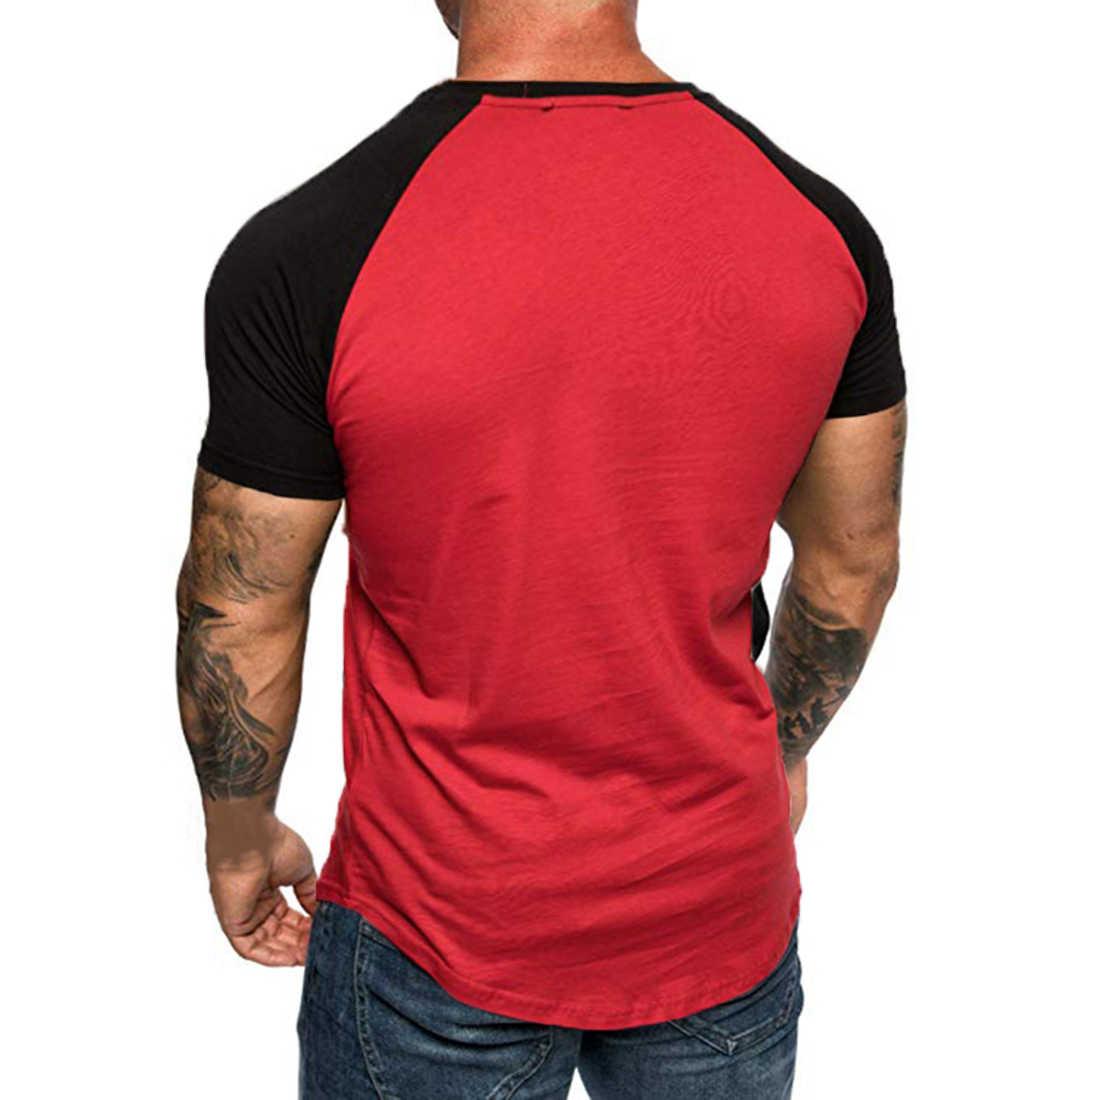 HEFLASHOR קיץ mens טלאים קצר t חולצה slim ספורט jogger בסיסית למעלה טי קרוע שרוול בתוספת גודל t חולצה camiseta hombre